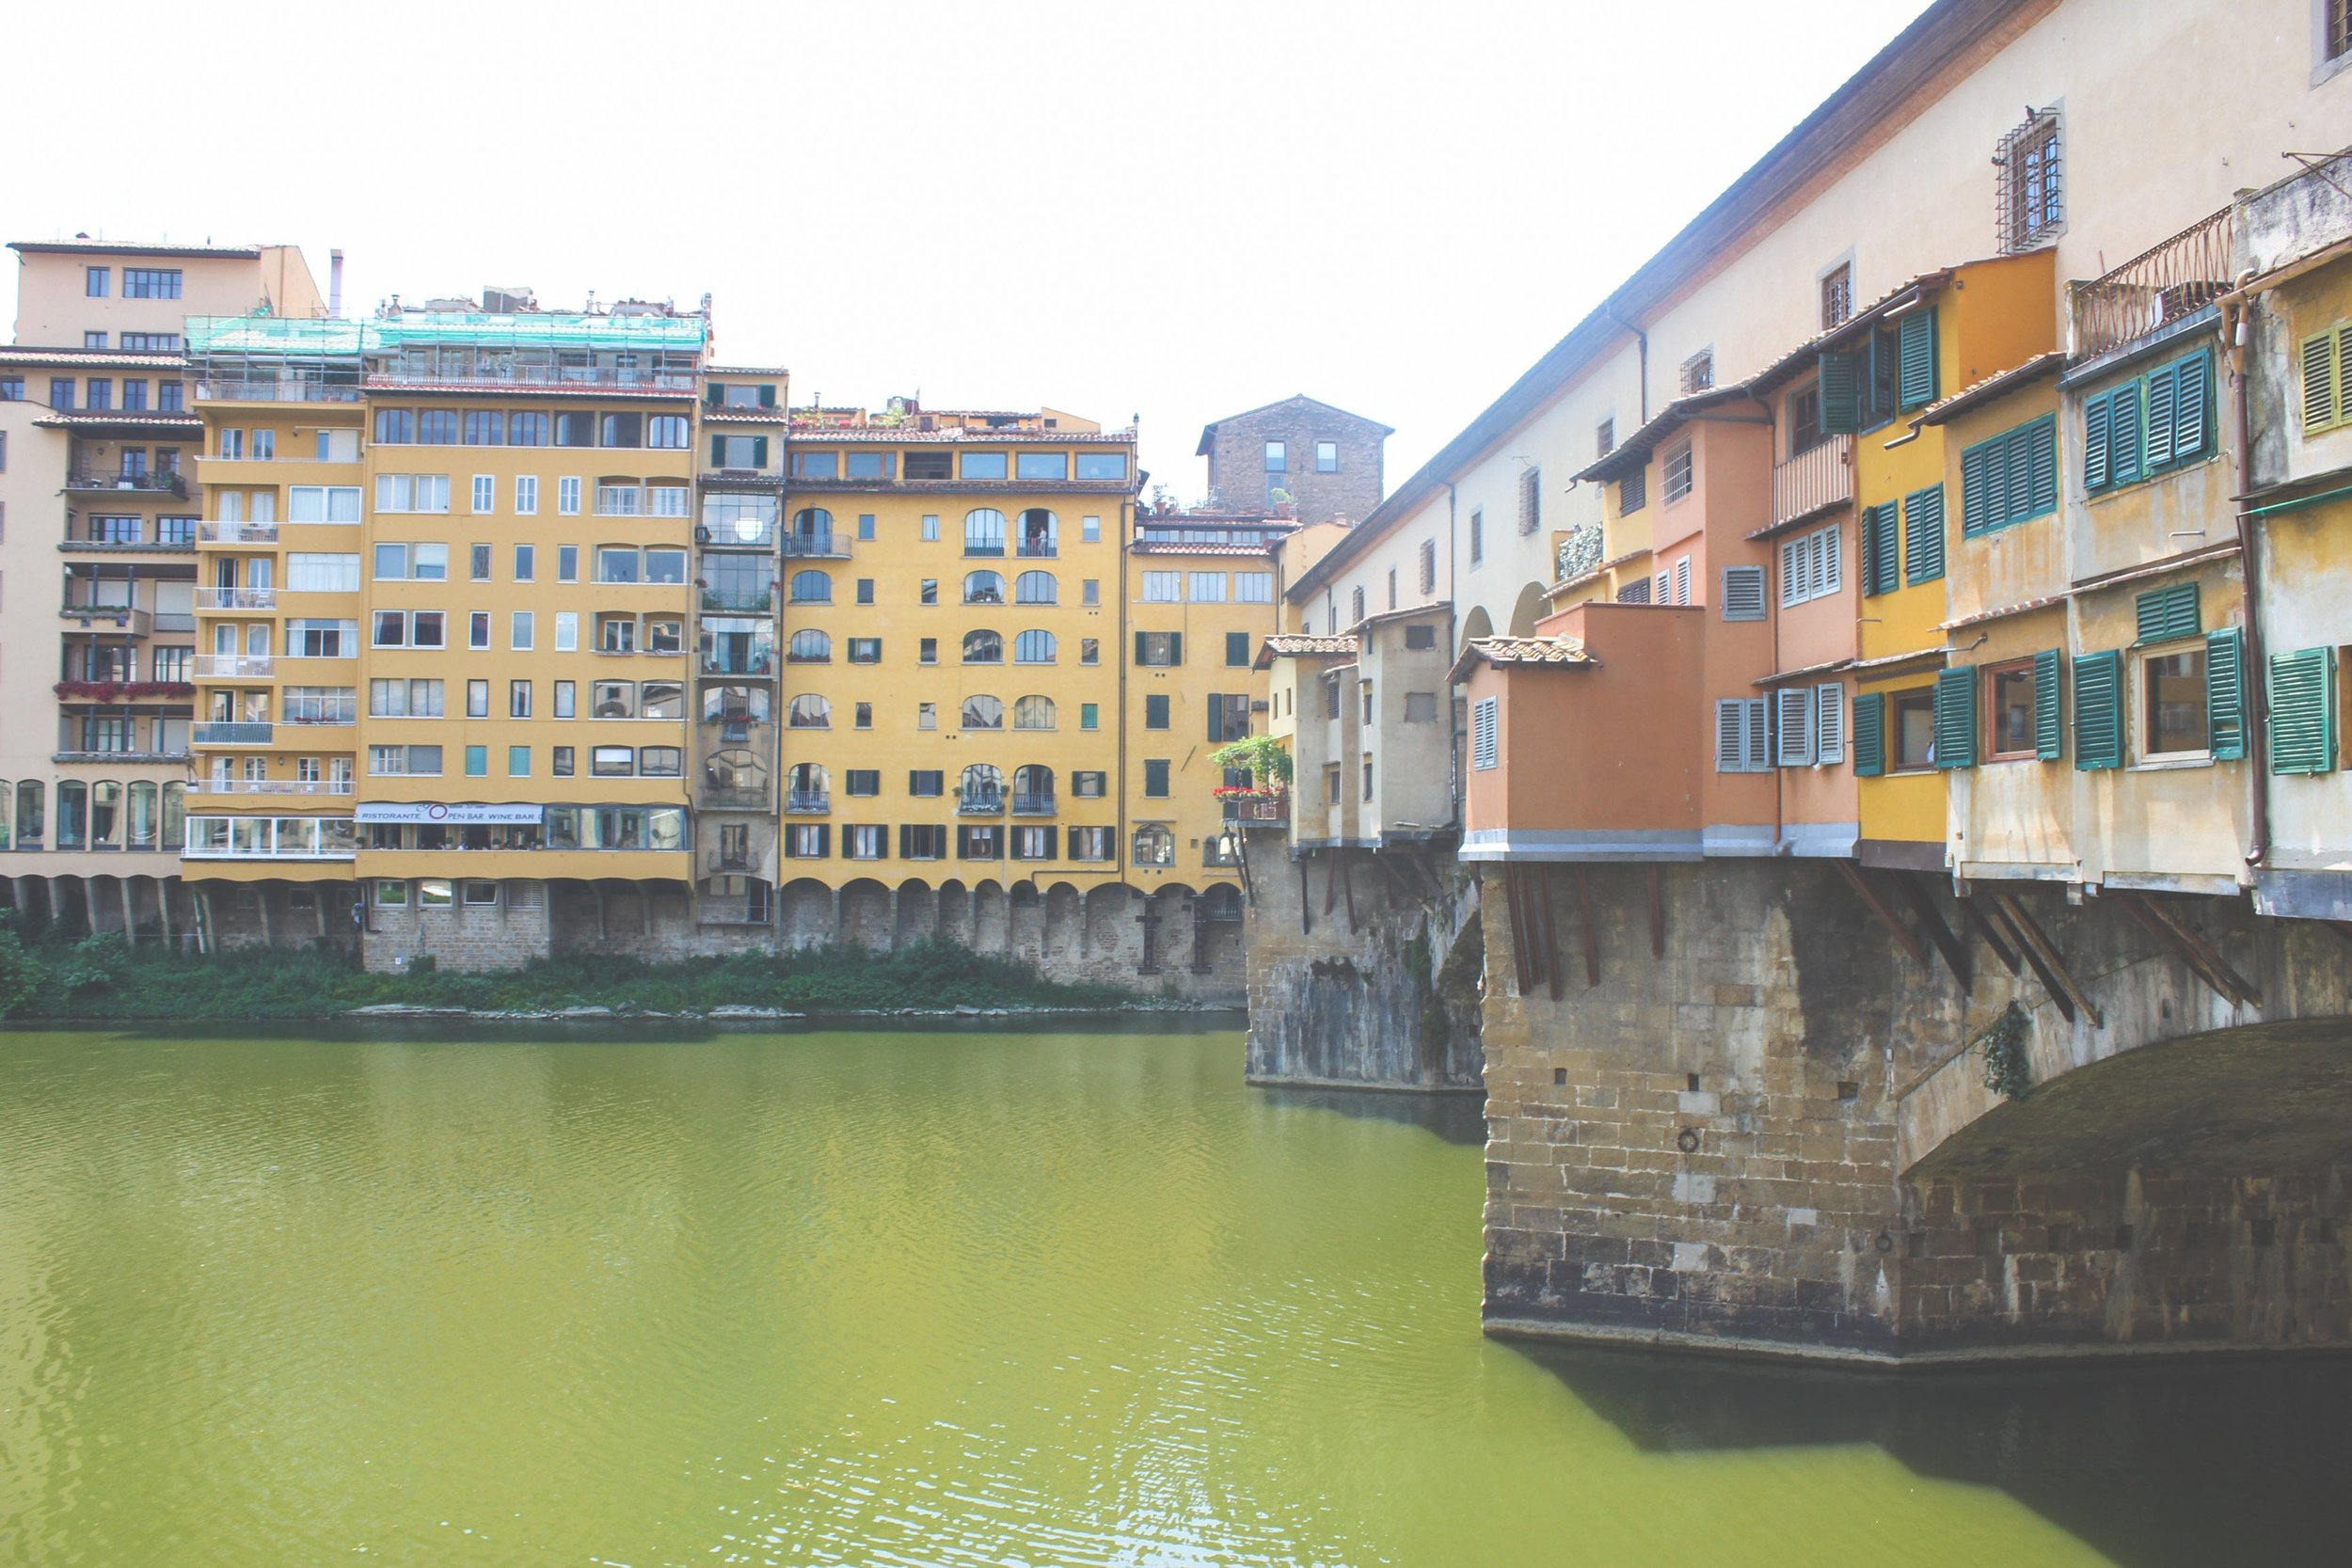 bridge-colorful-houses-florence-Shamia-Casiano.jpg